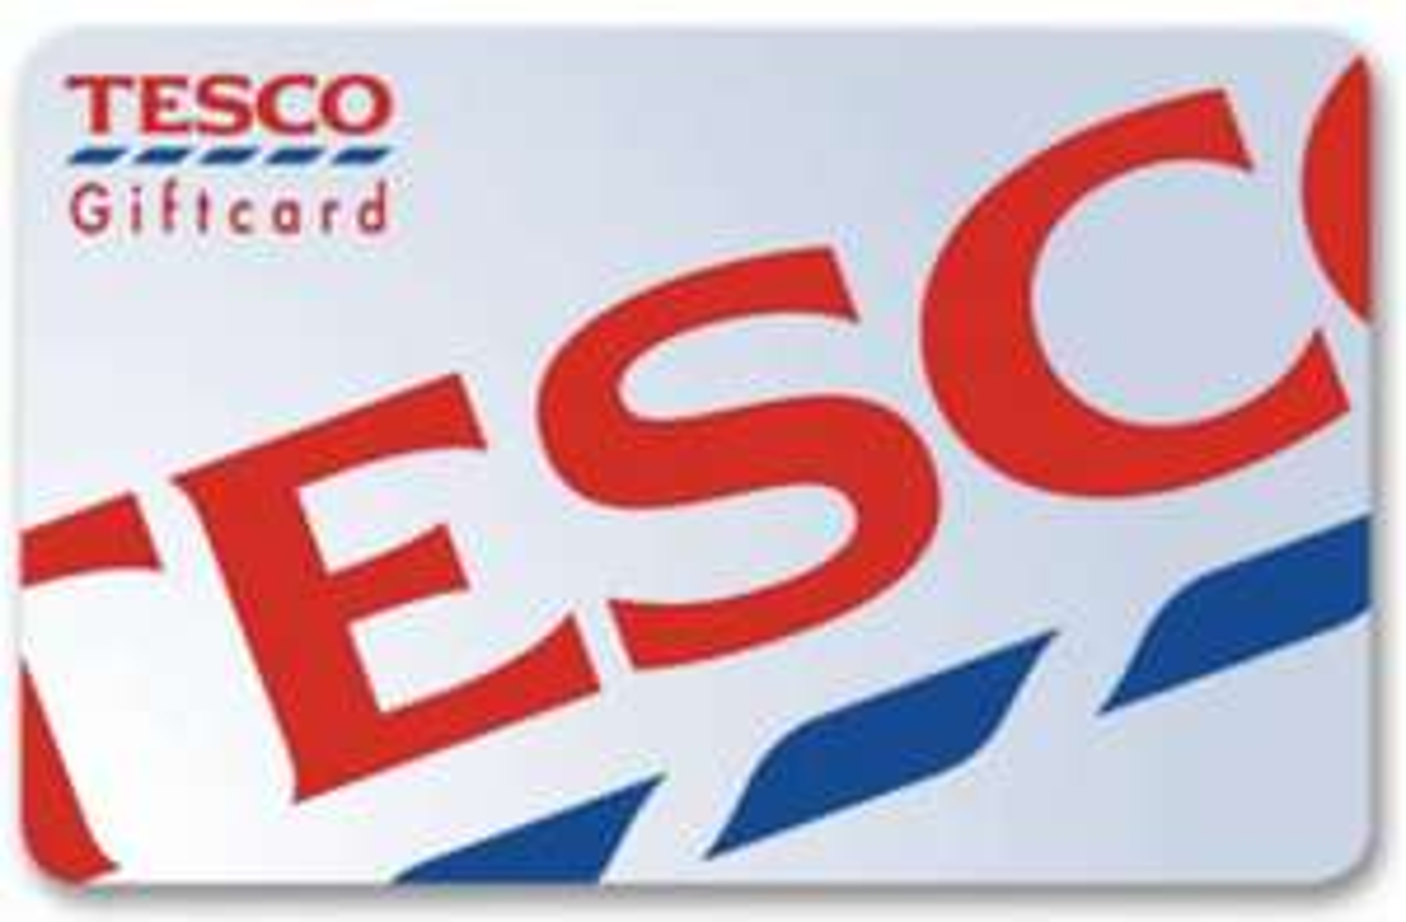 £5 Tesco GiftCard Bonus when buying Tesco Gift Card of £50 @ Tesco (InStore)